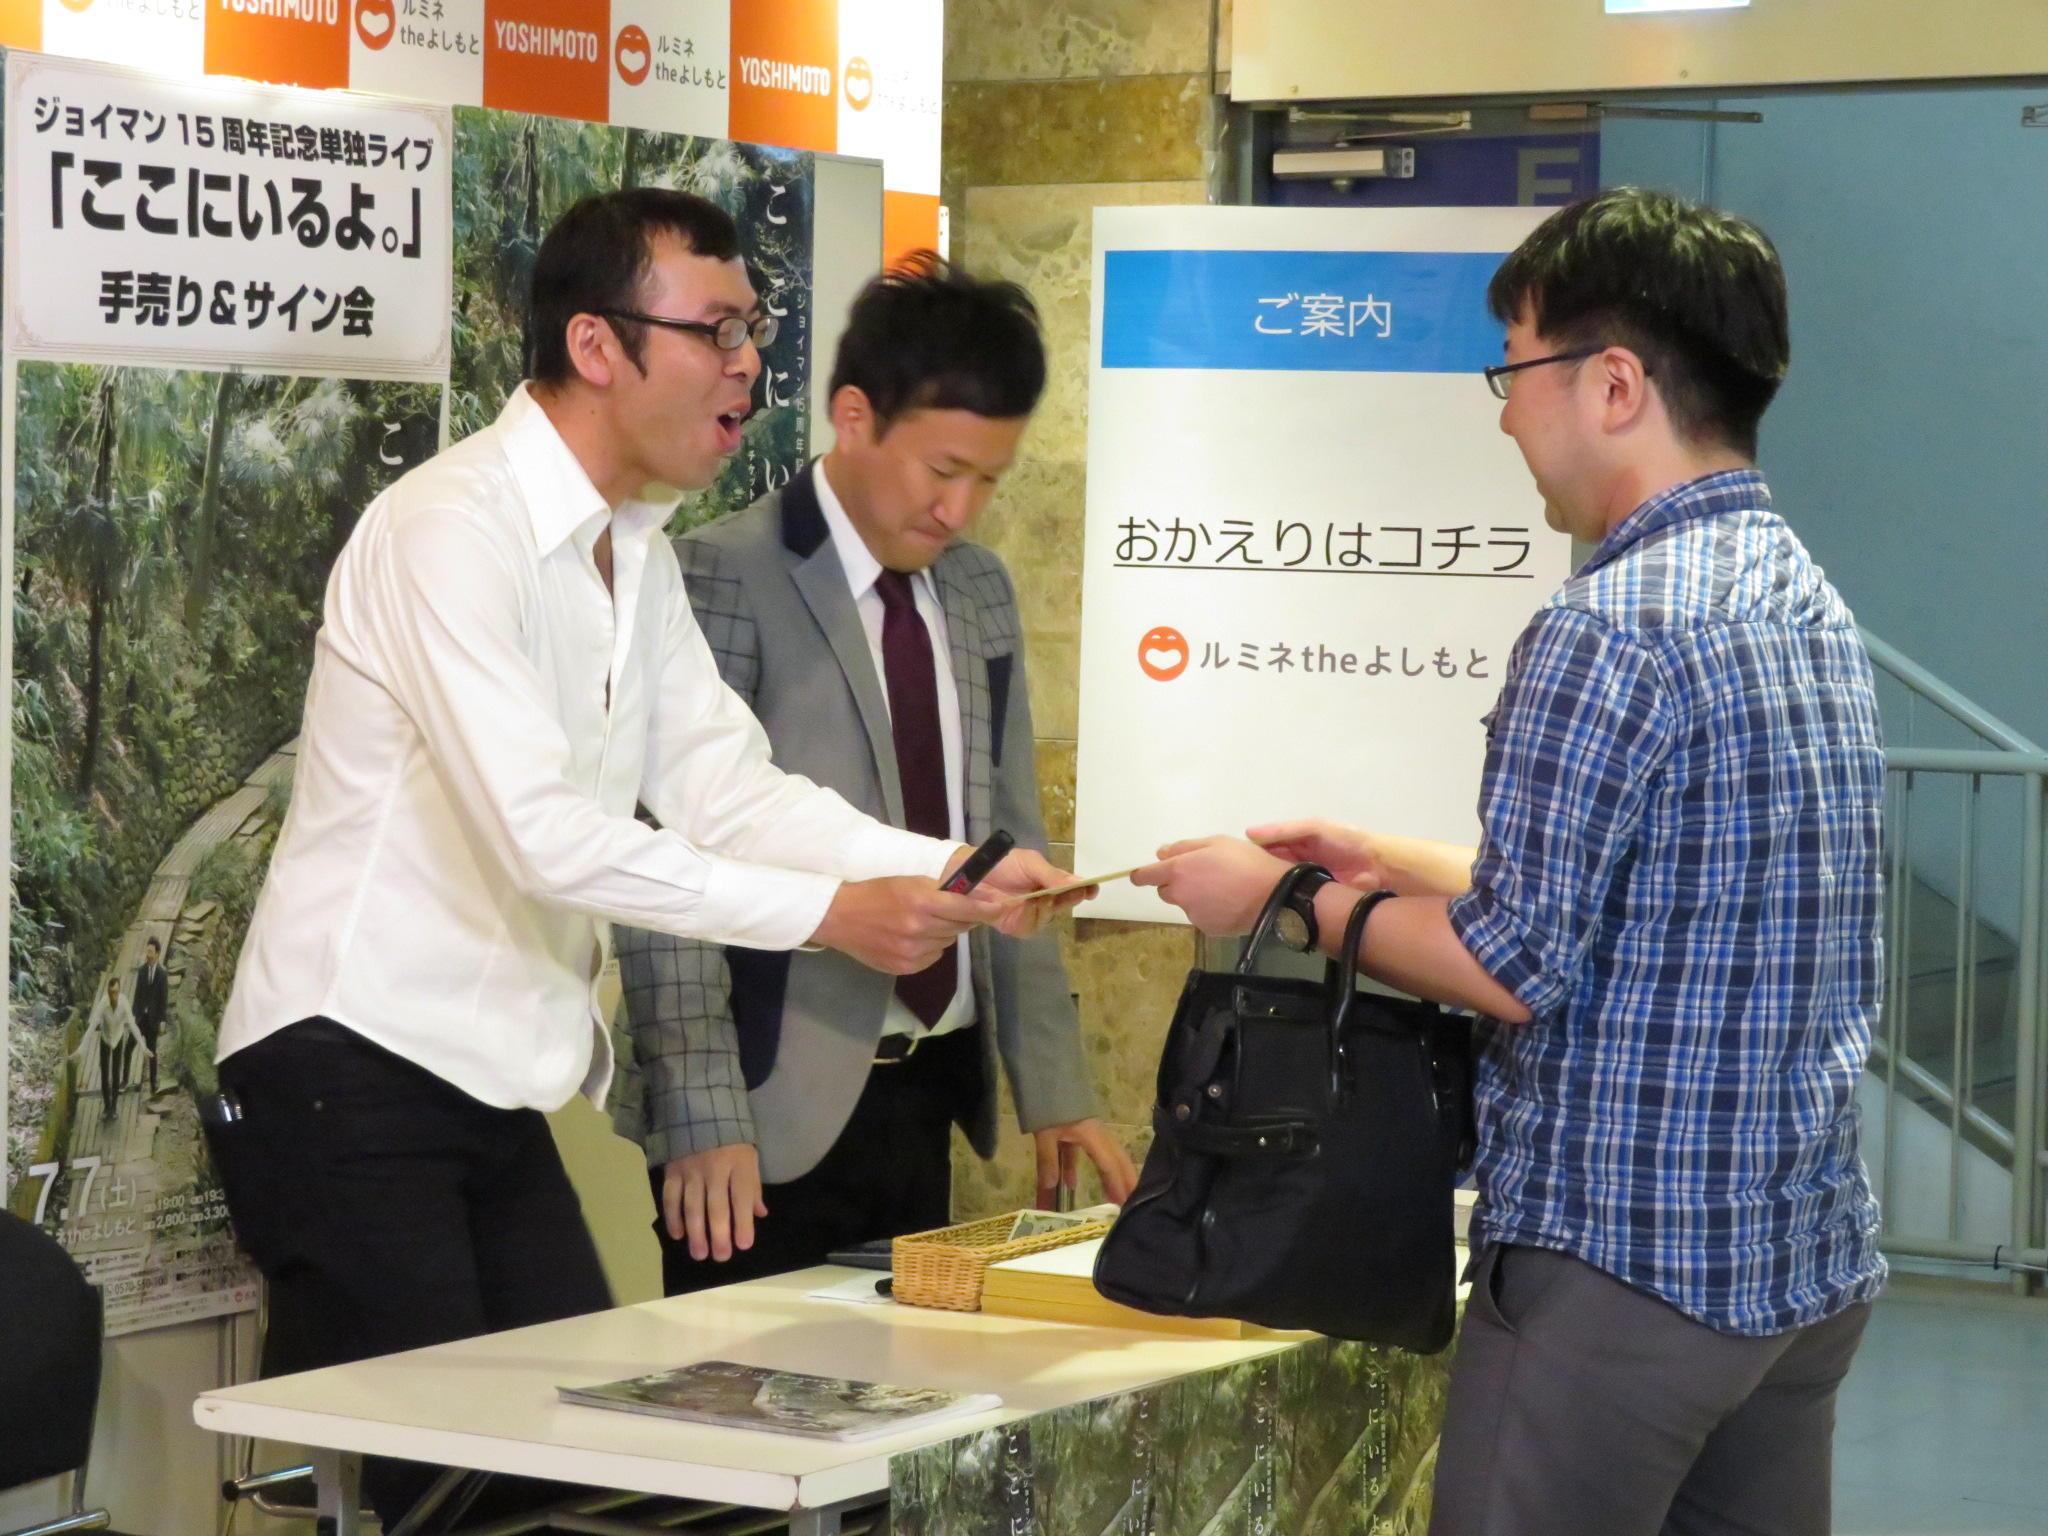 http://news.yoshimoto.co.jp/20180515004021-cc4a88052aa1229efc9ddbc4efed66e7a3ba9514.jpg